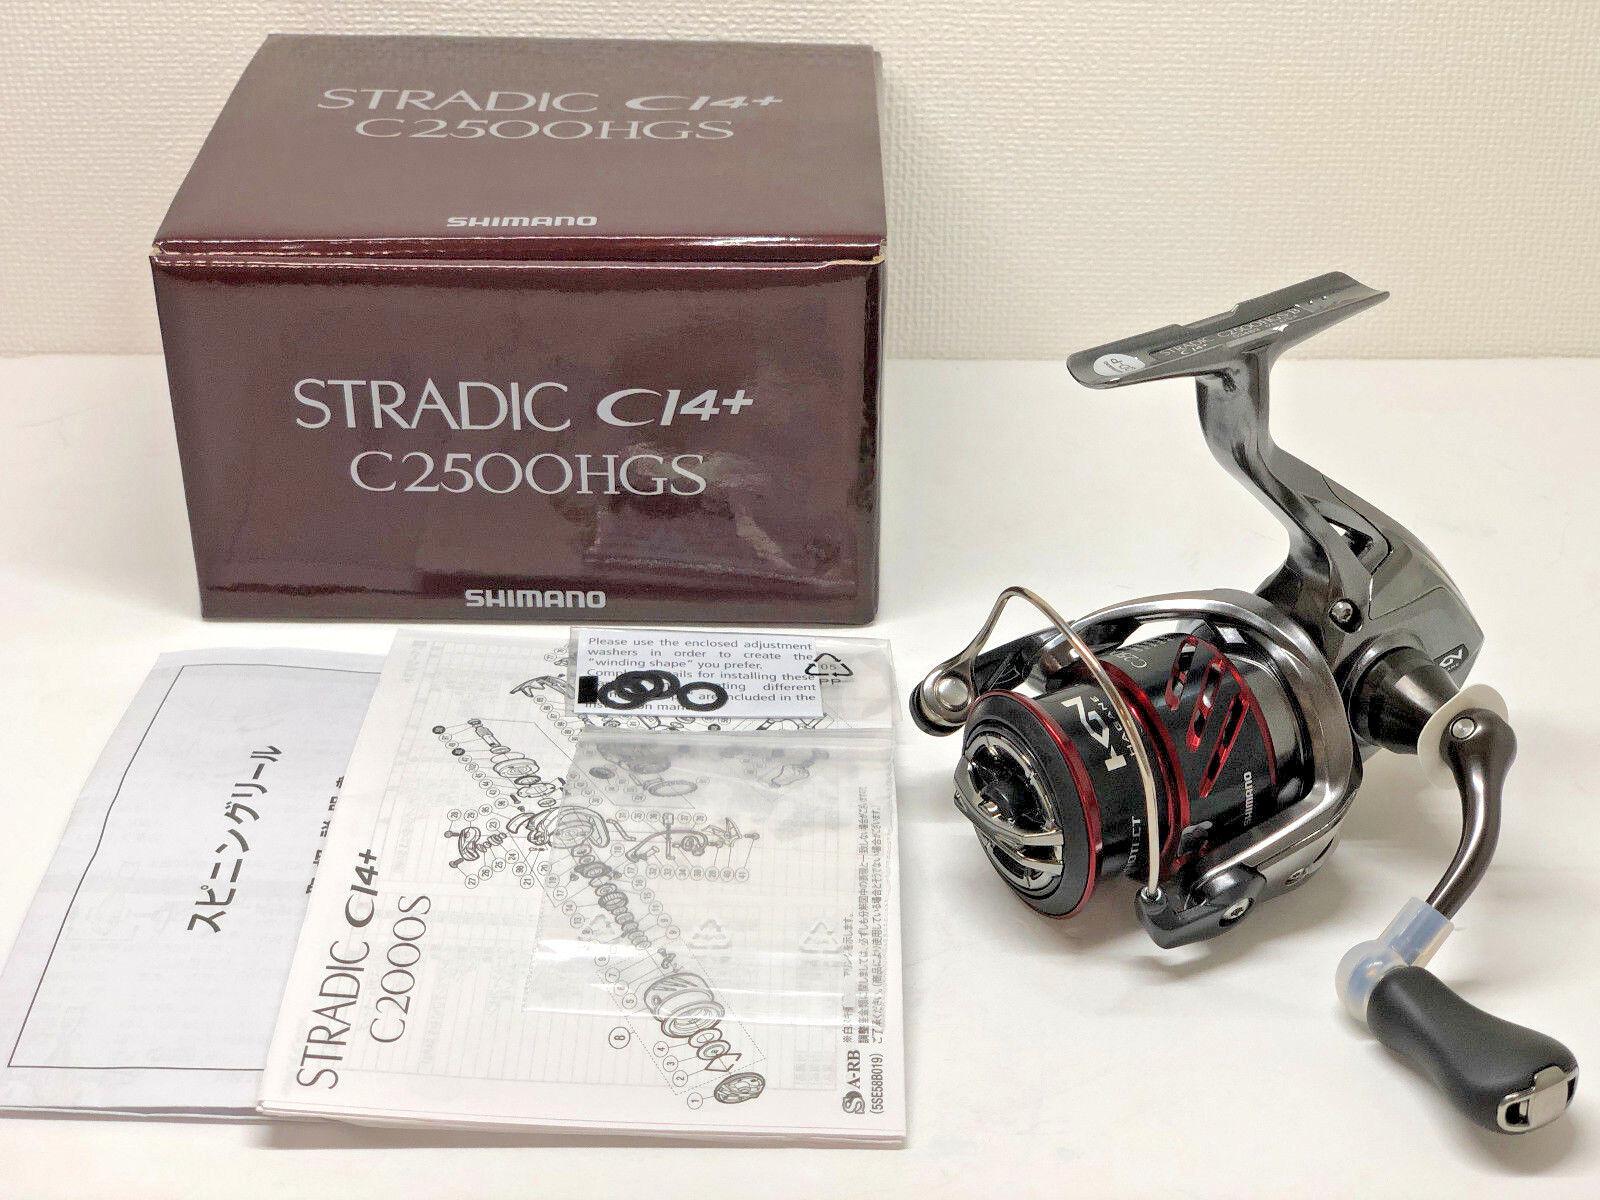 SHIMANO 16 STRADIC CI4+ C2500HGS   - Free Shipping from Japan